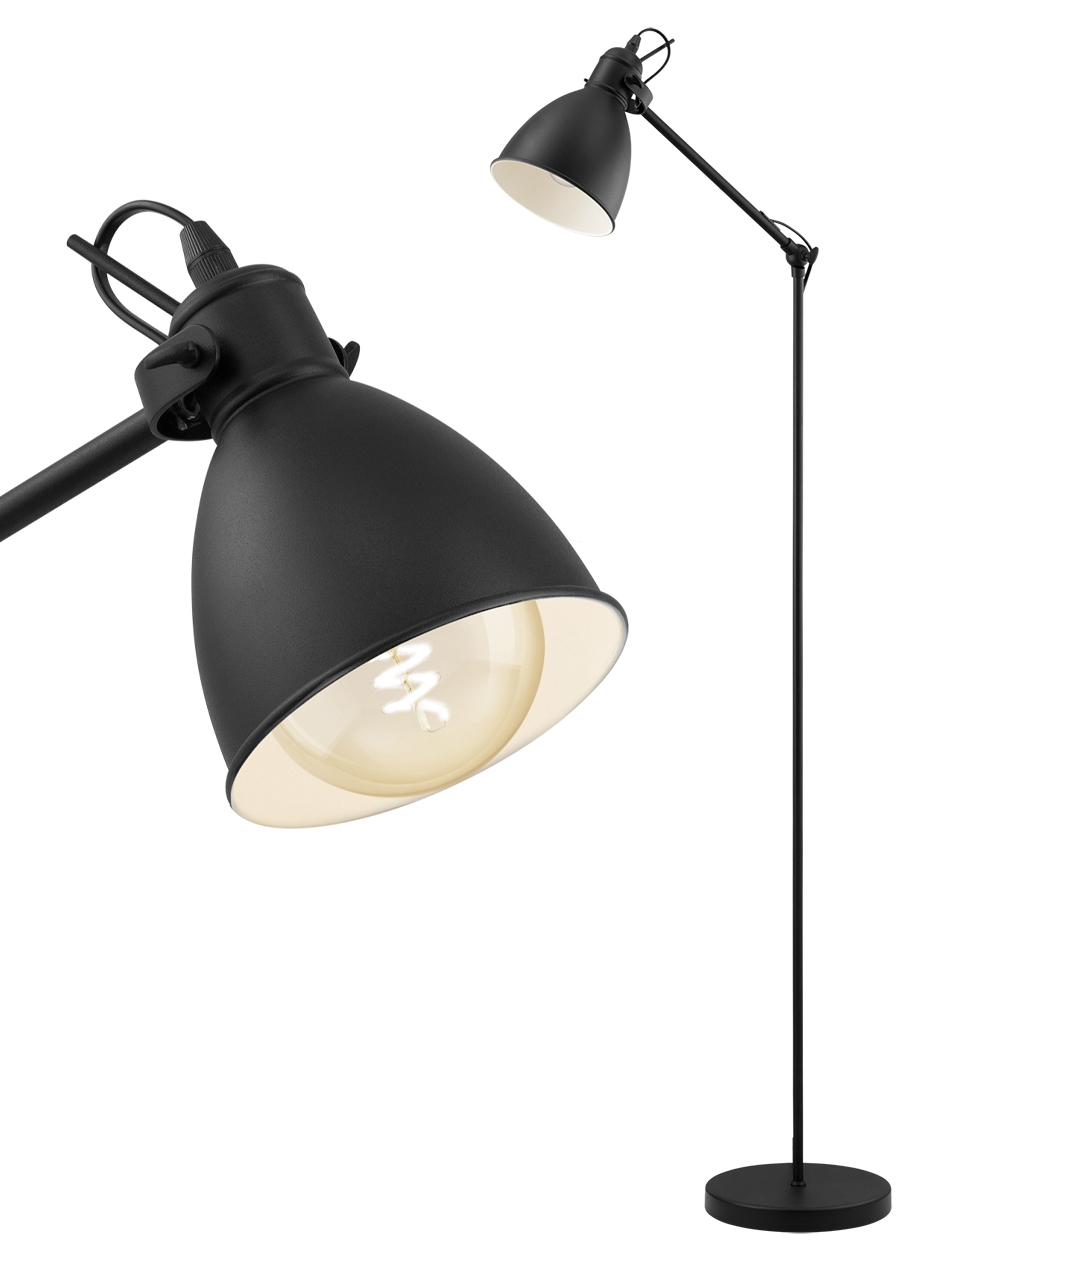 Black Vintage Style Floor Lamp